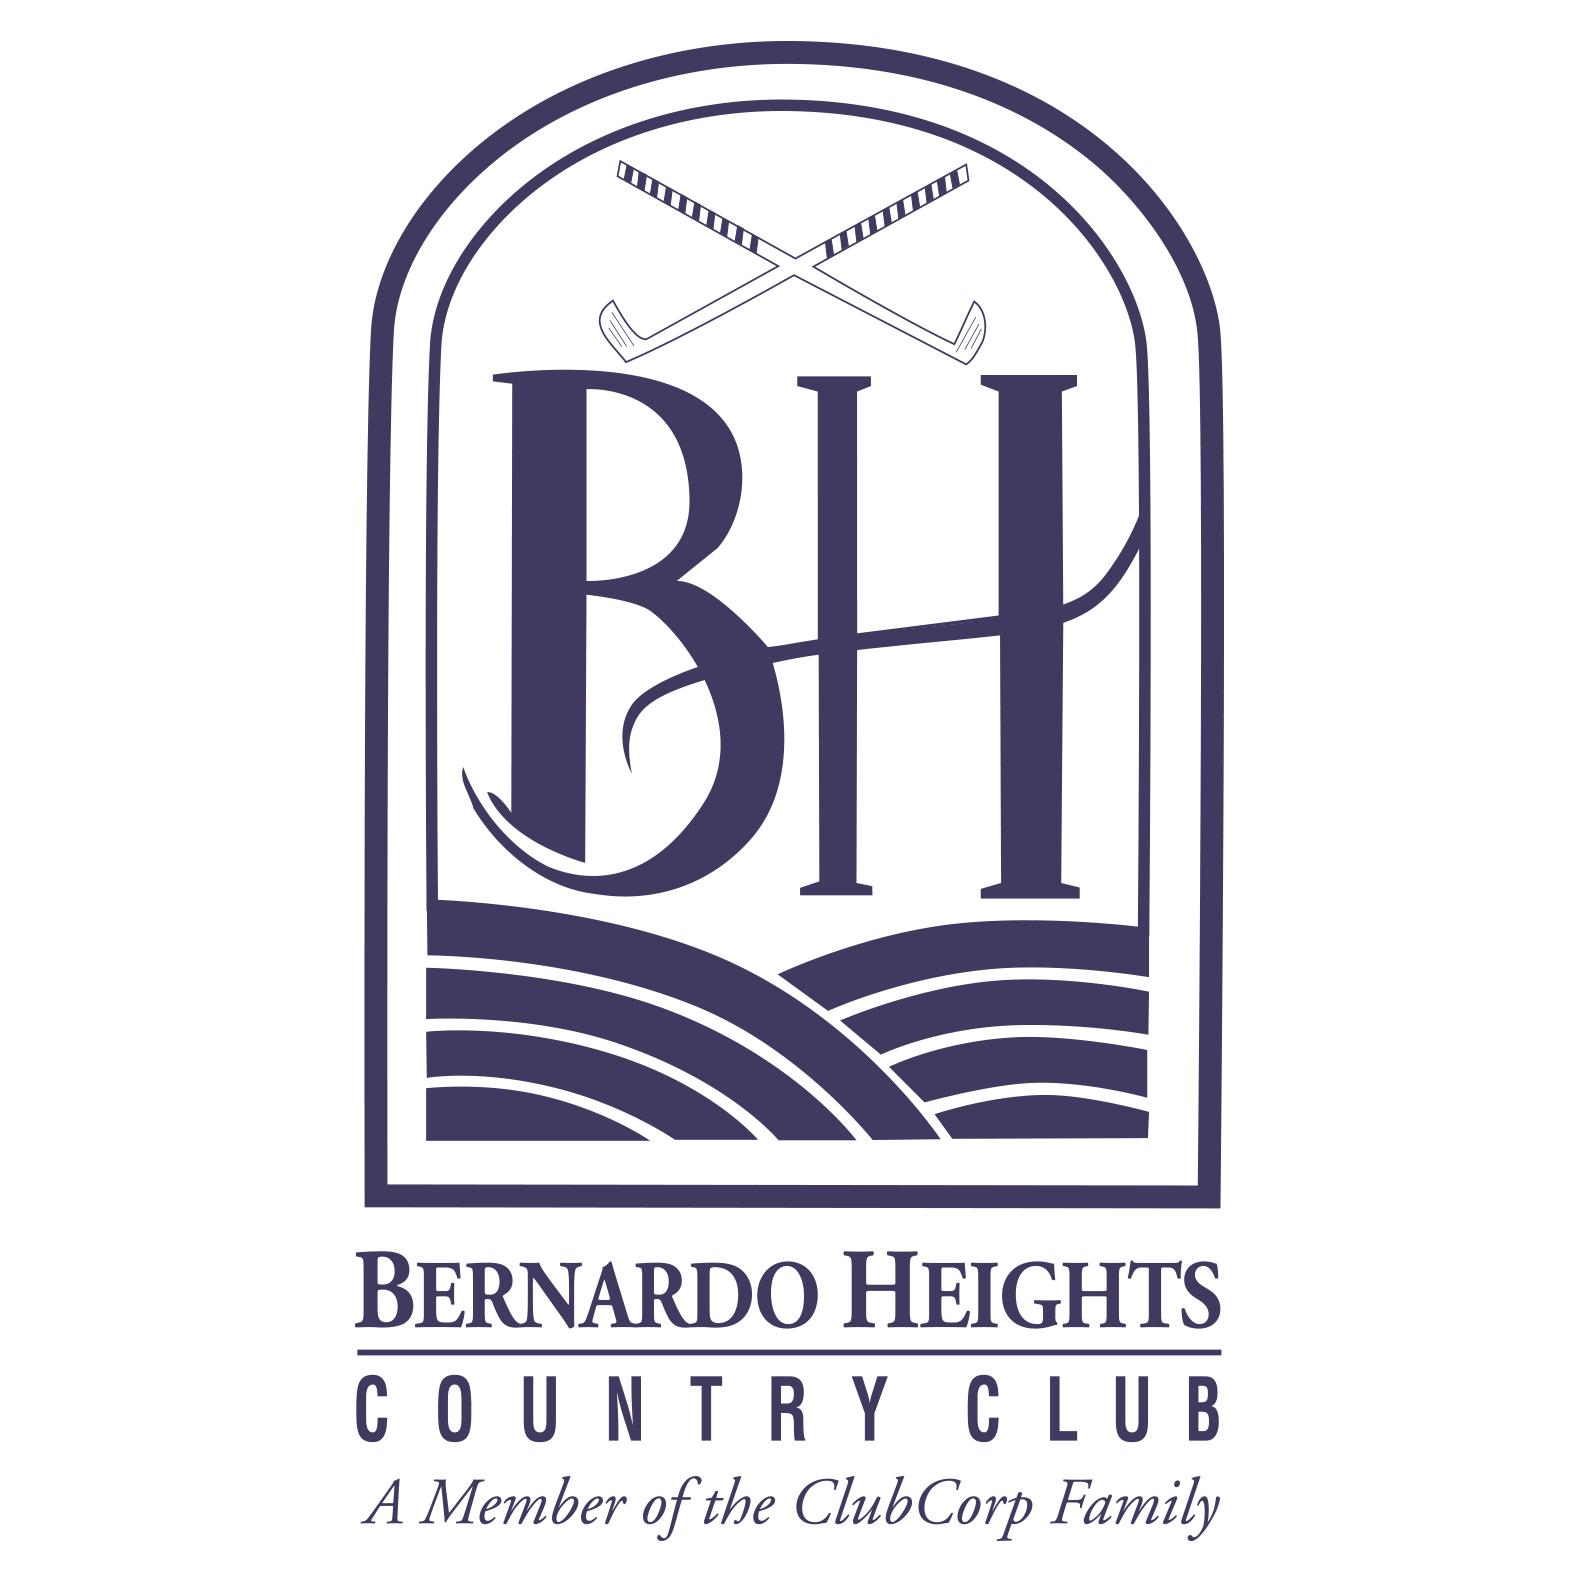 Bernardo Heights Country Club